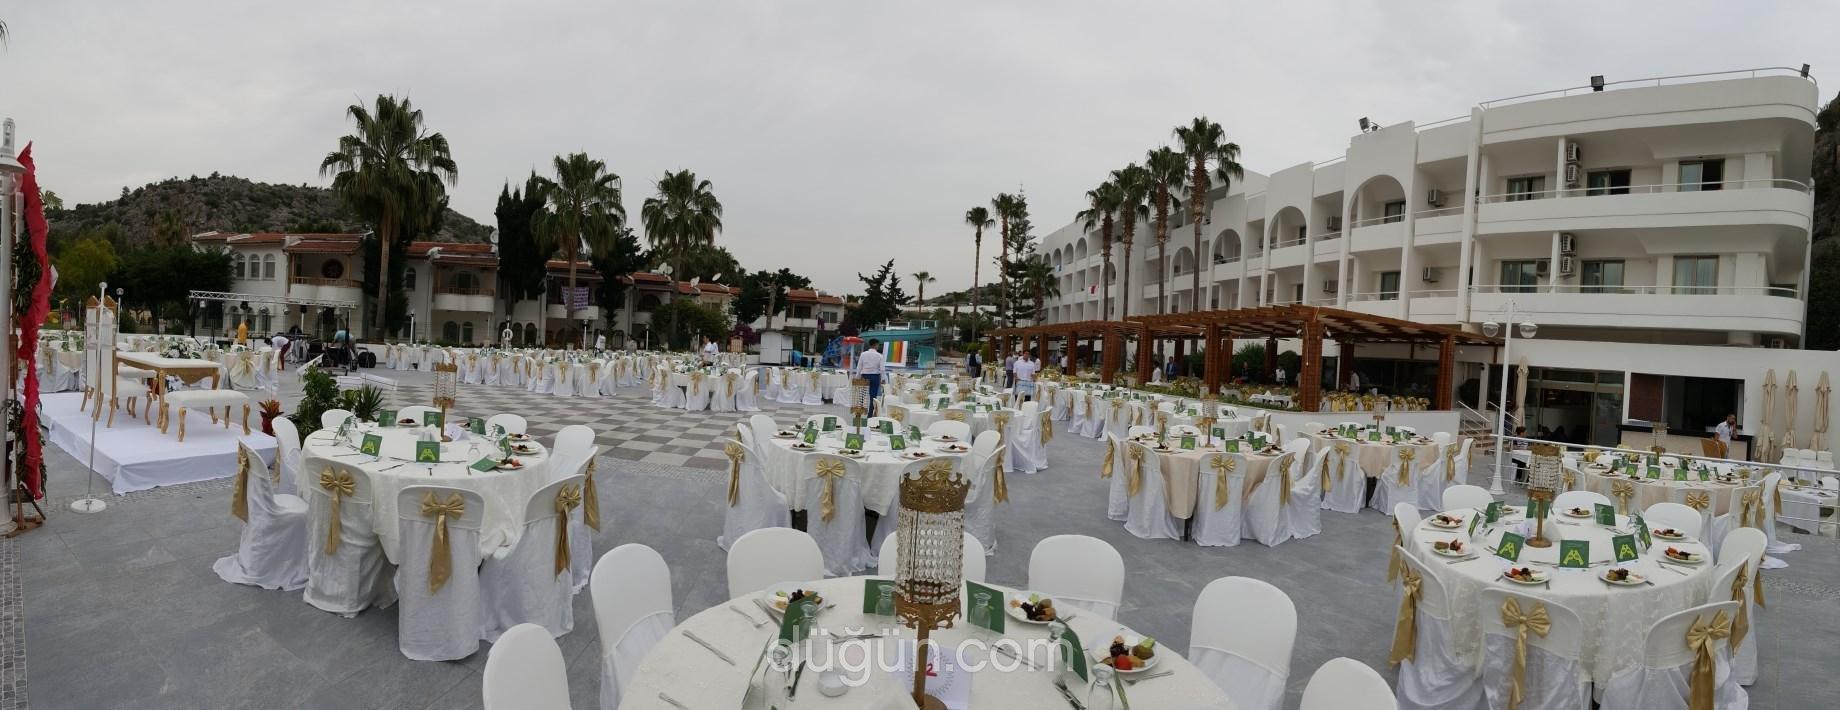 Altın Orfoz Hotel & Resort